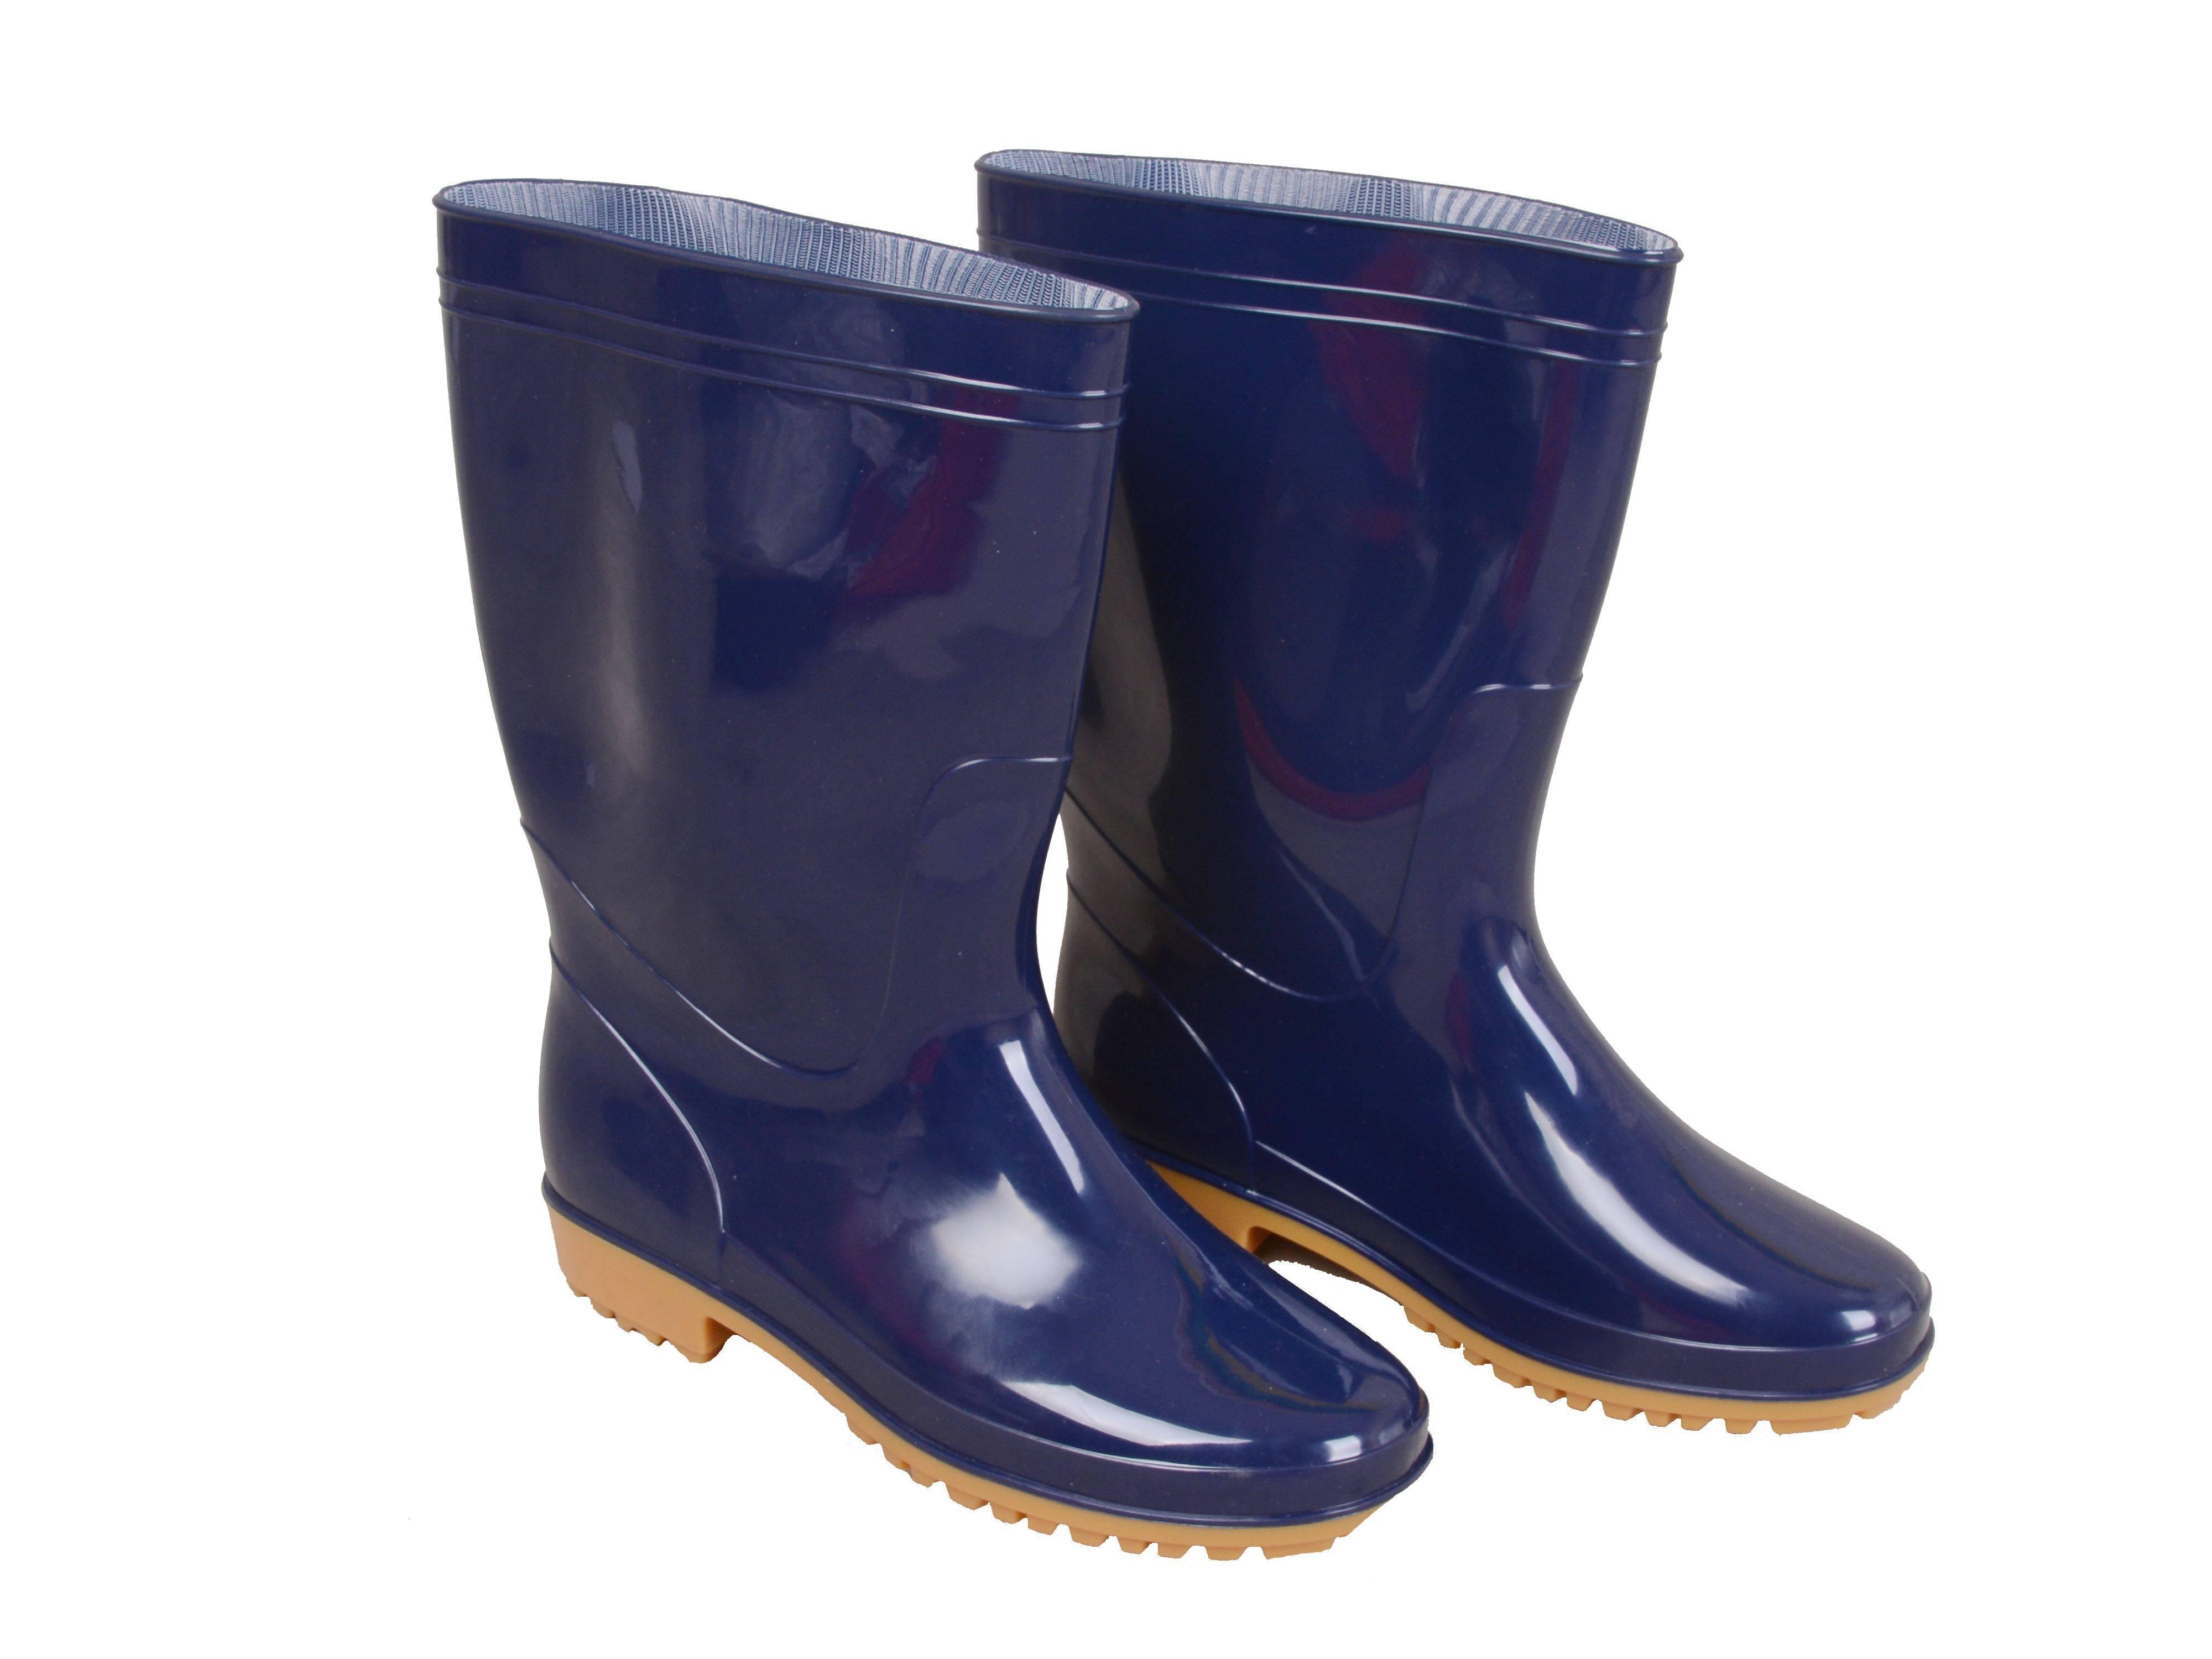 WRB-1001 BLUE PVC VINYL MEN BEST RAIN BOOTS